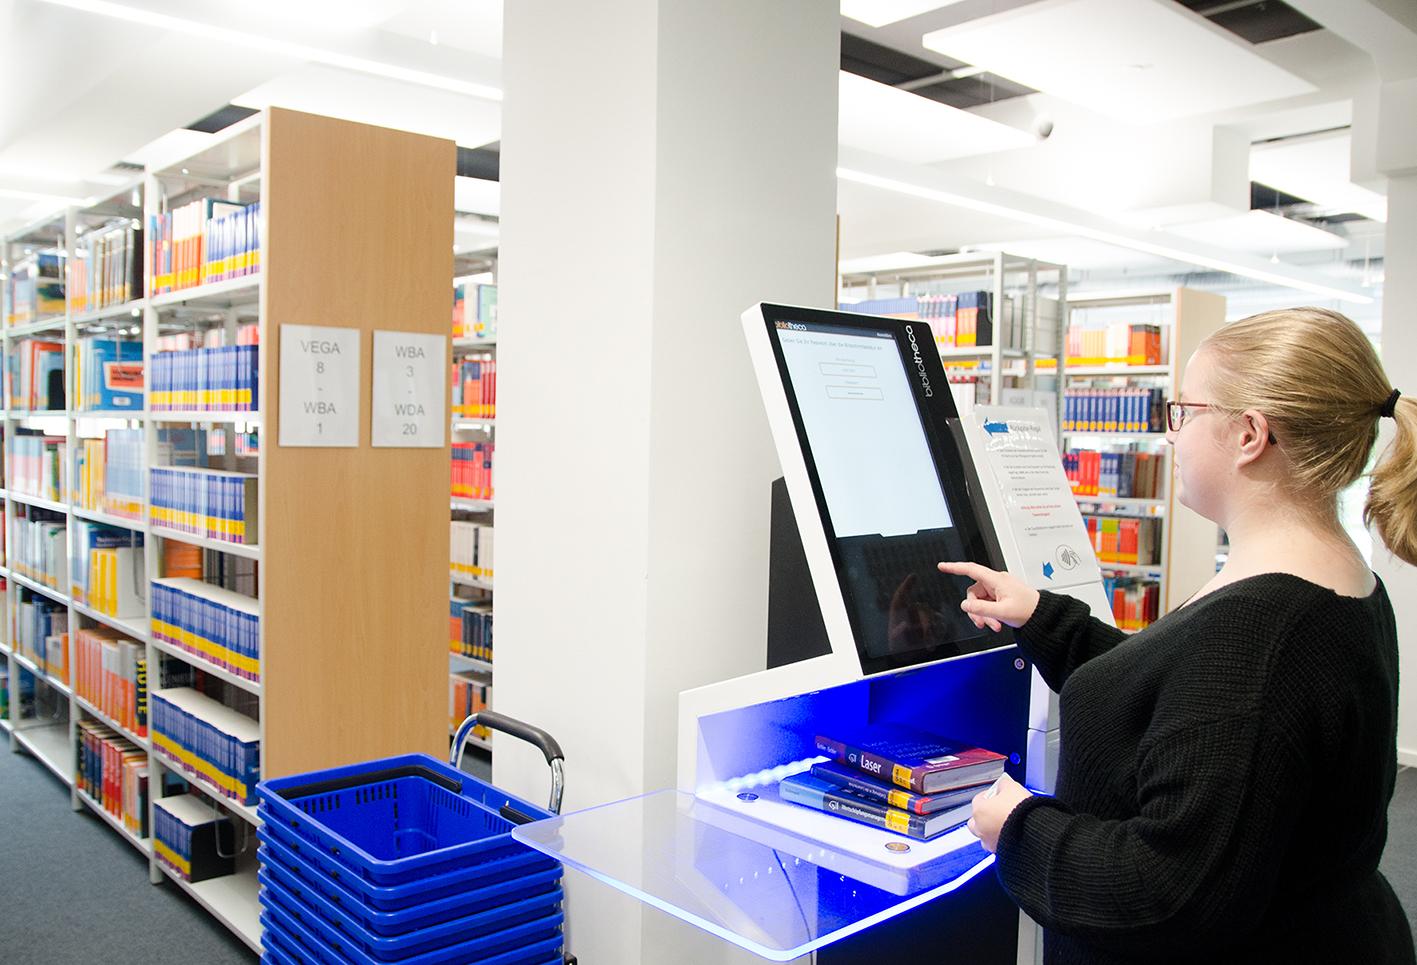 Neue Bibliothek, Ausleihautomat